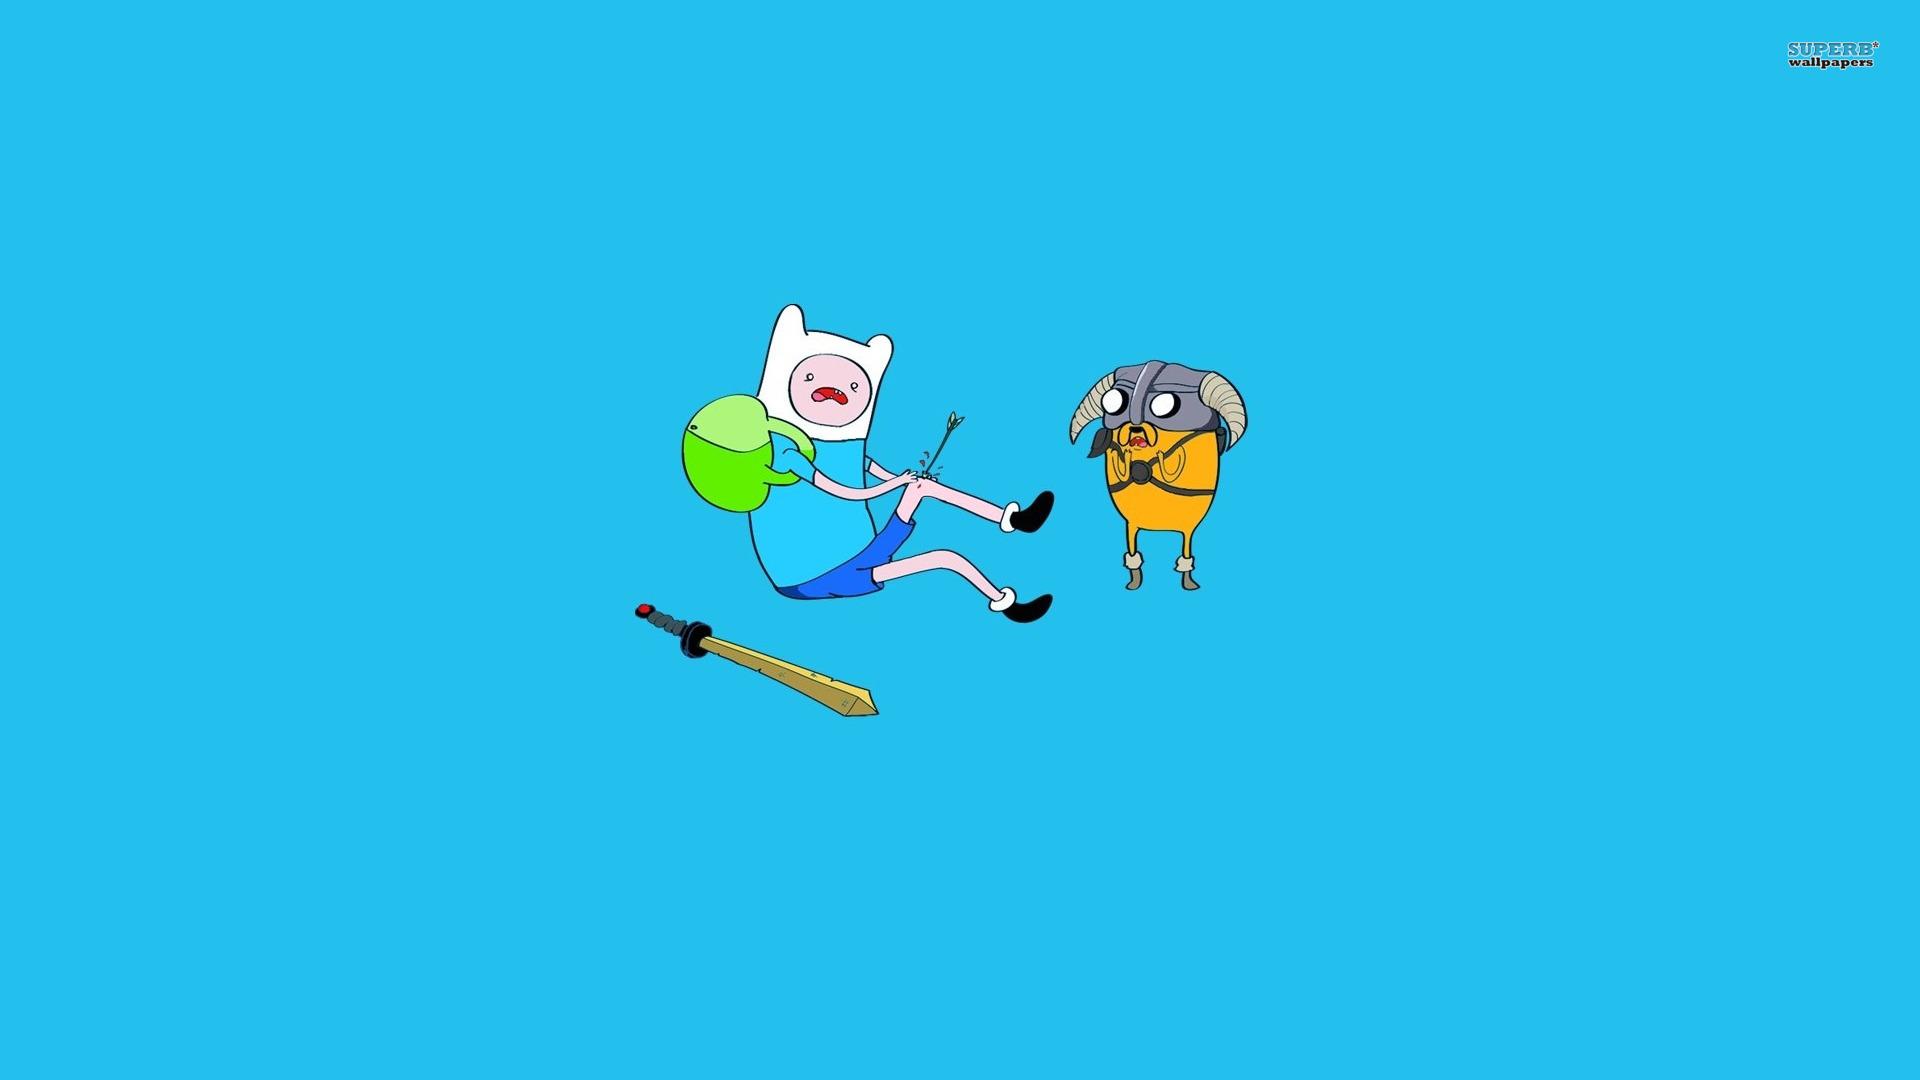 50 Adventure Time Wallpaper 1920x1080 On Wallpapersafari